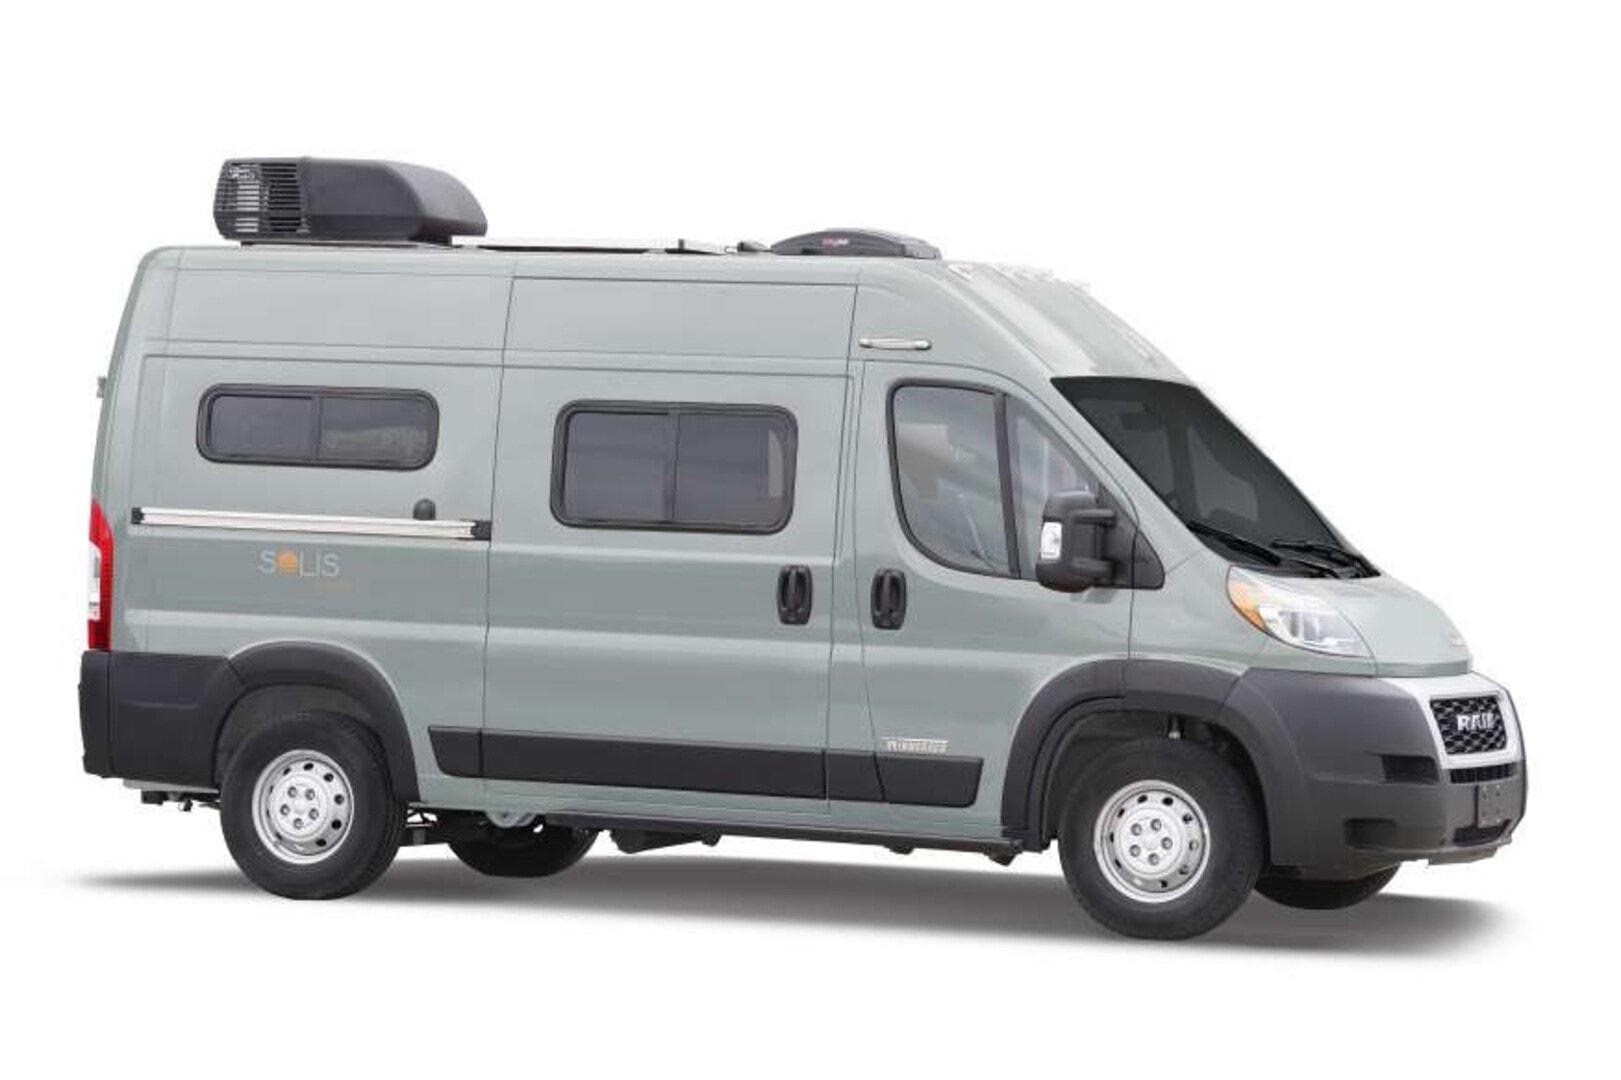 New, 2022, Winnebago, Solis Pocket, RV - Class B